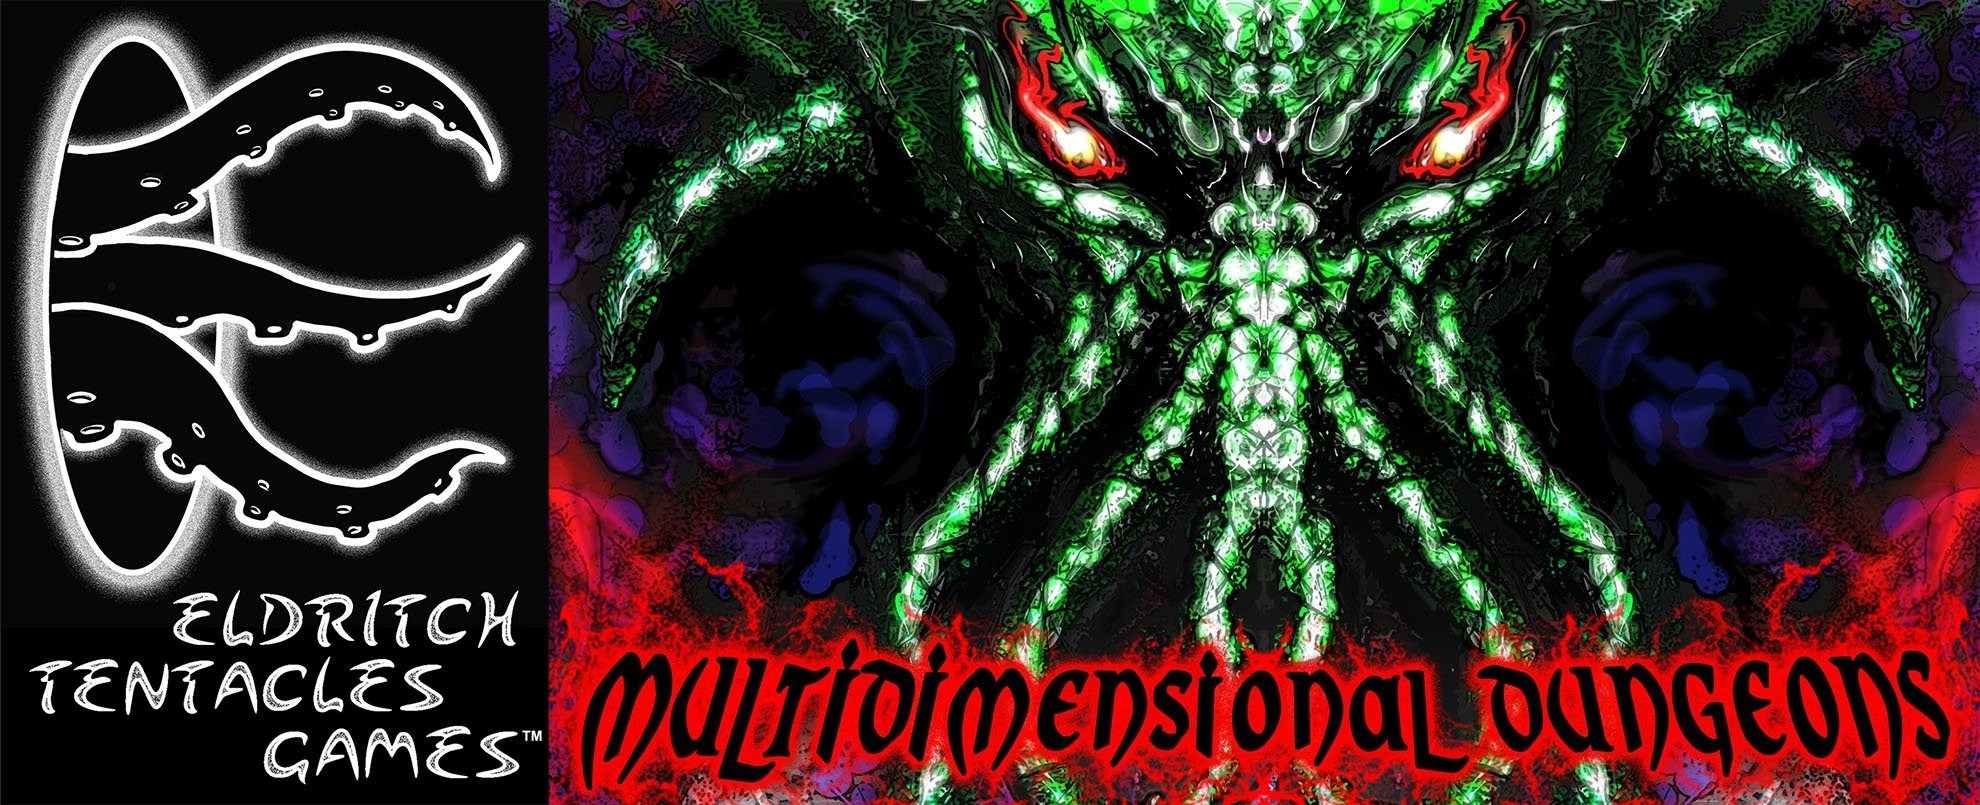 Eldritch Tentacles Multidimensional Dungeons